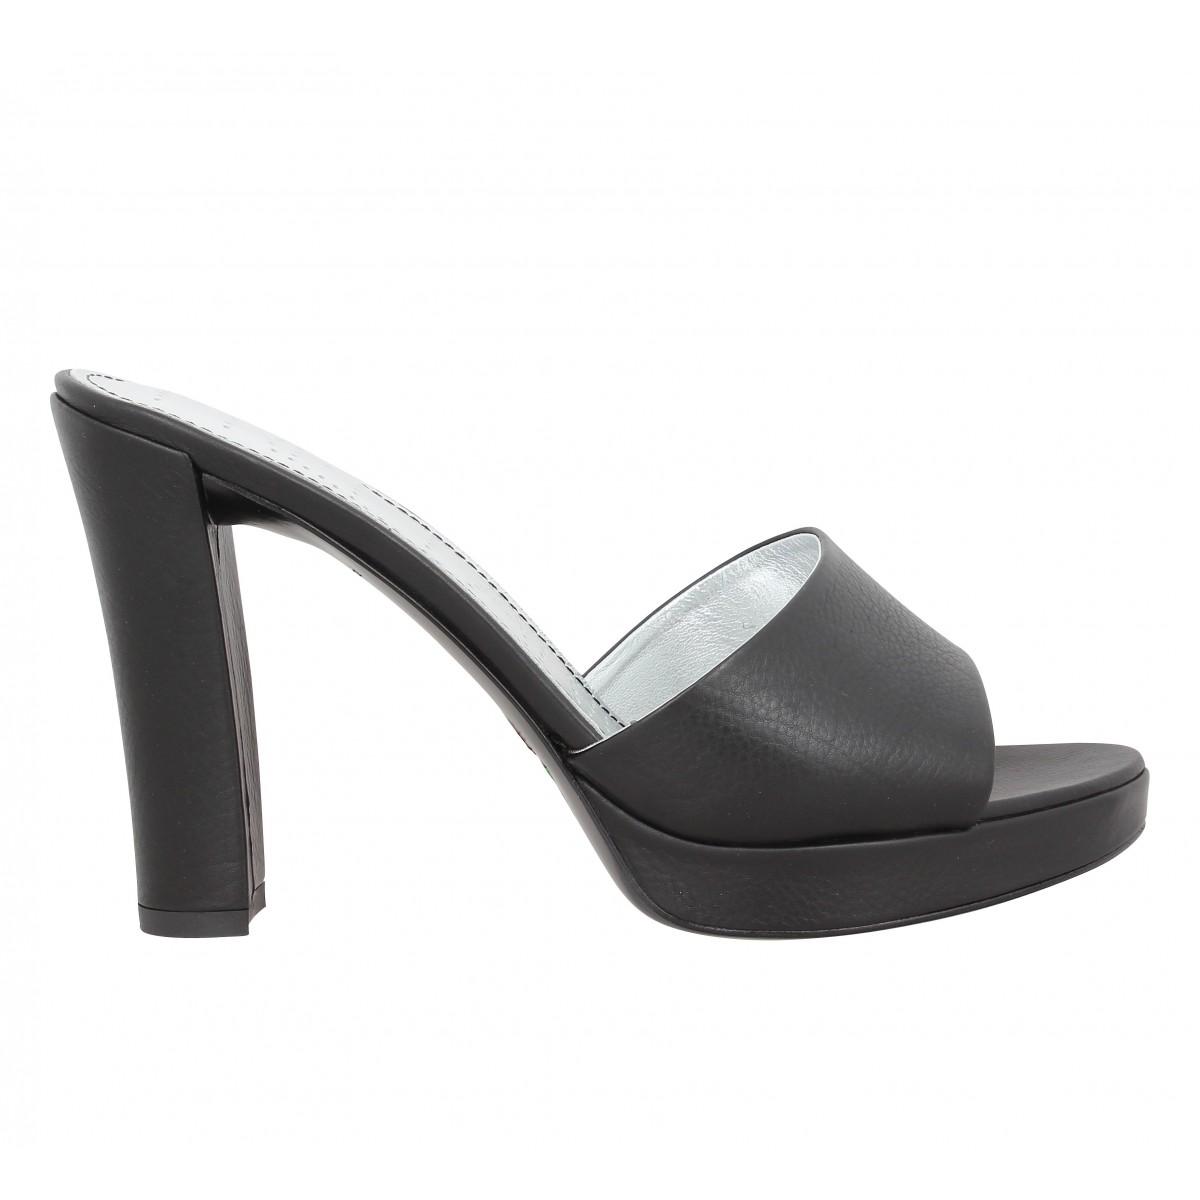 chaussures mules cuir femme. Black Bedroom Furniture Sets. Home Design Ideas